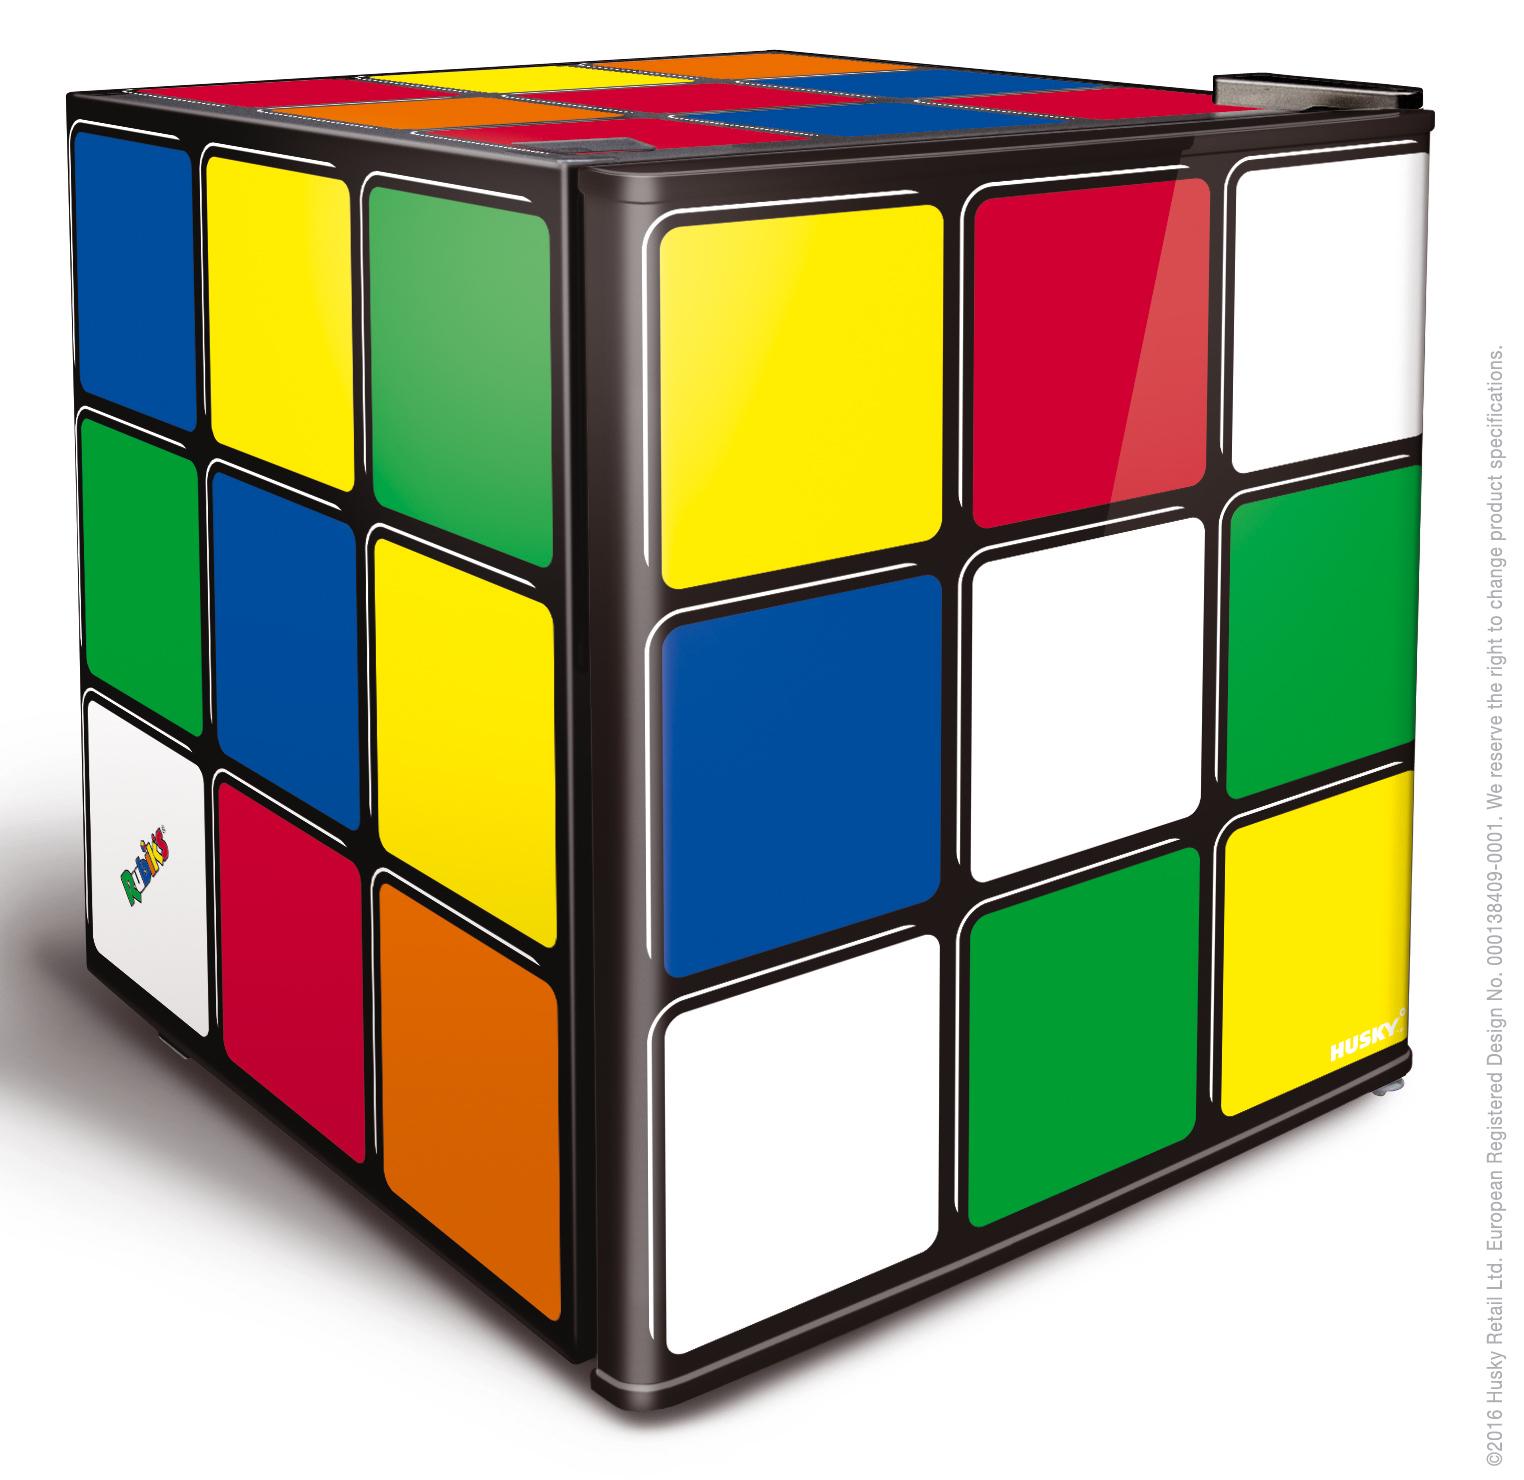 46L Counter-Top Mini Fridge - Solid Door - Rubiks Cube